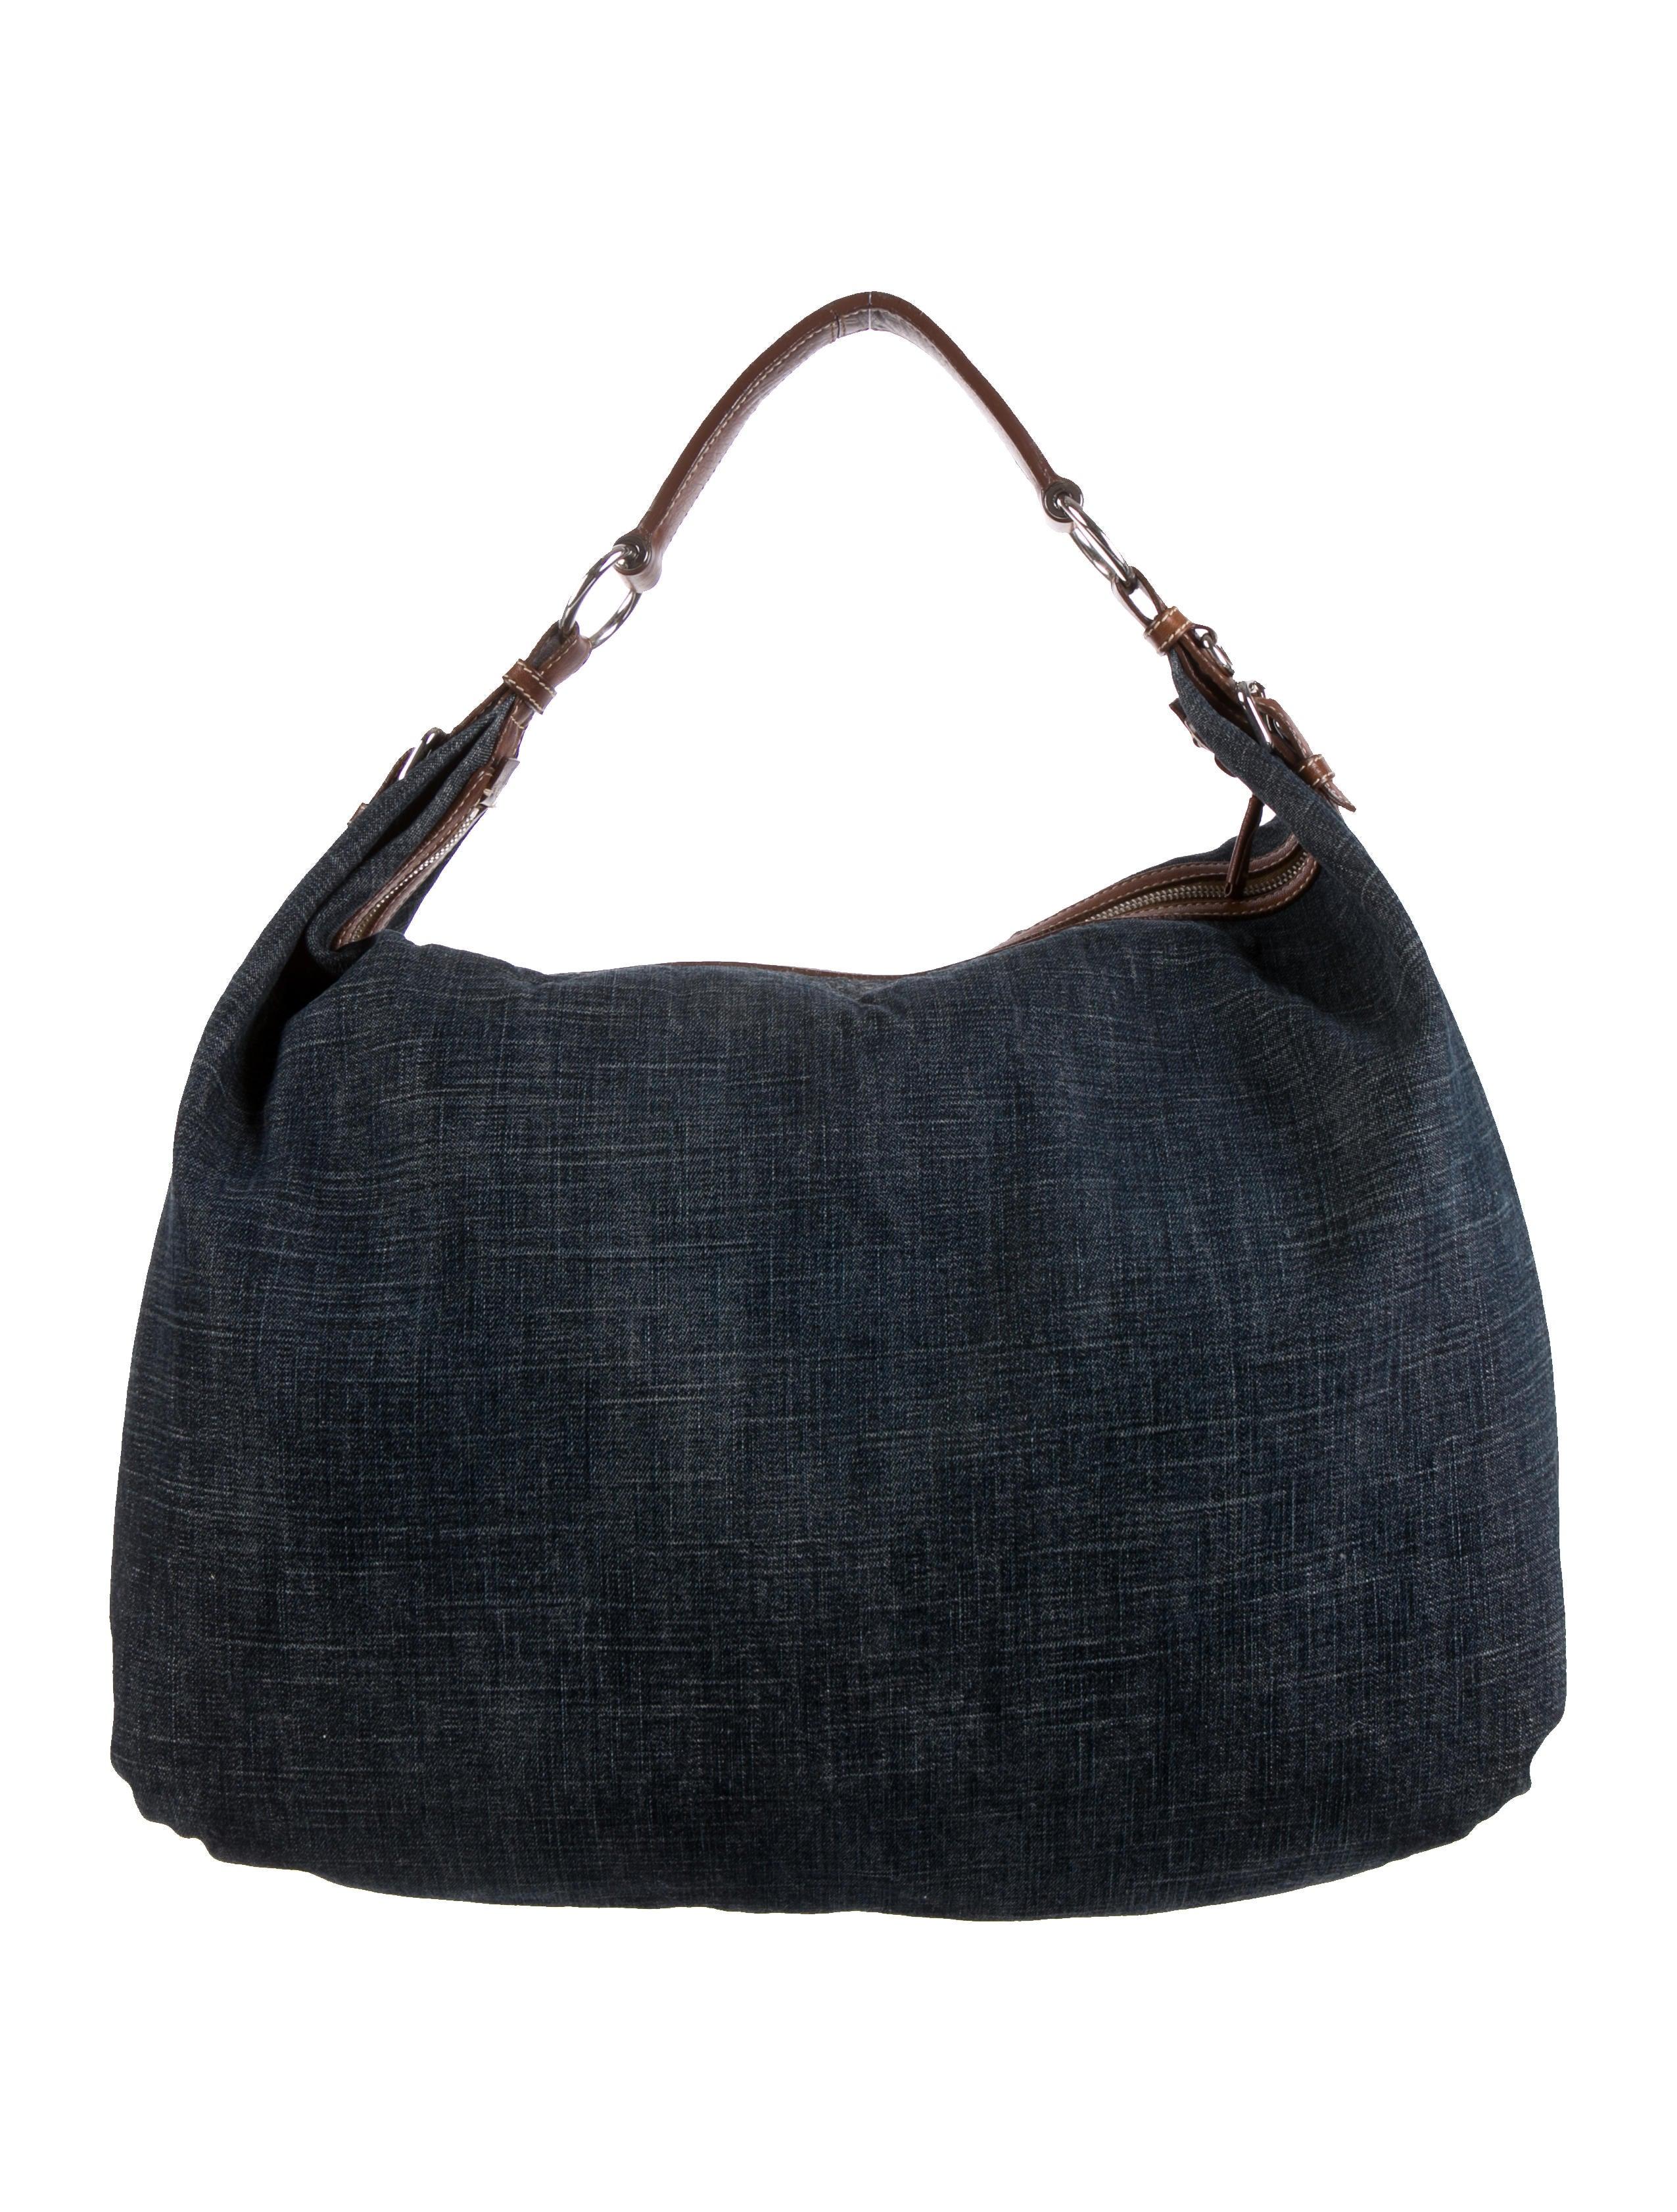 fake prada handbags for sale prada tote bags leather. Black Bedroom Furniture Sets. Home Design Ideas